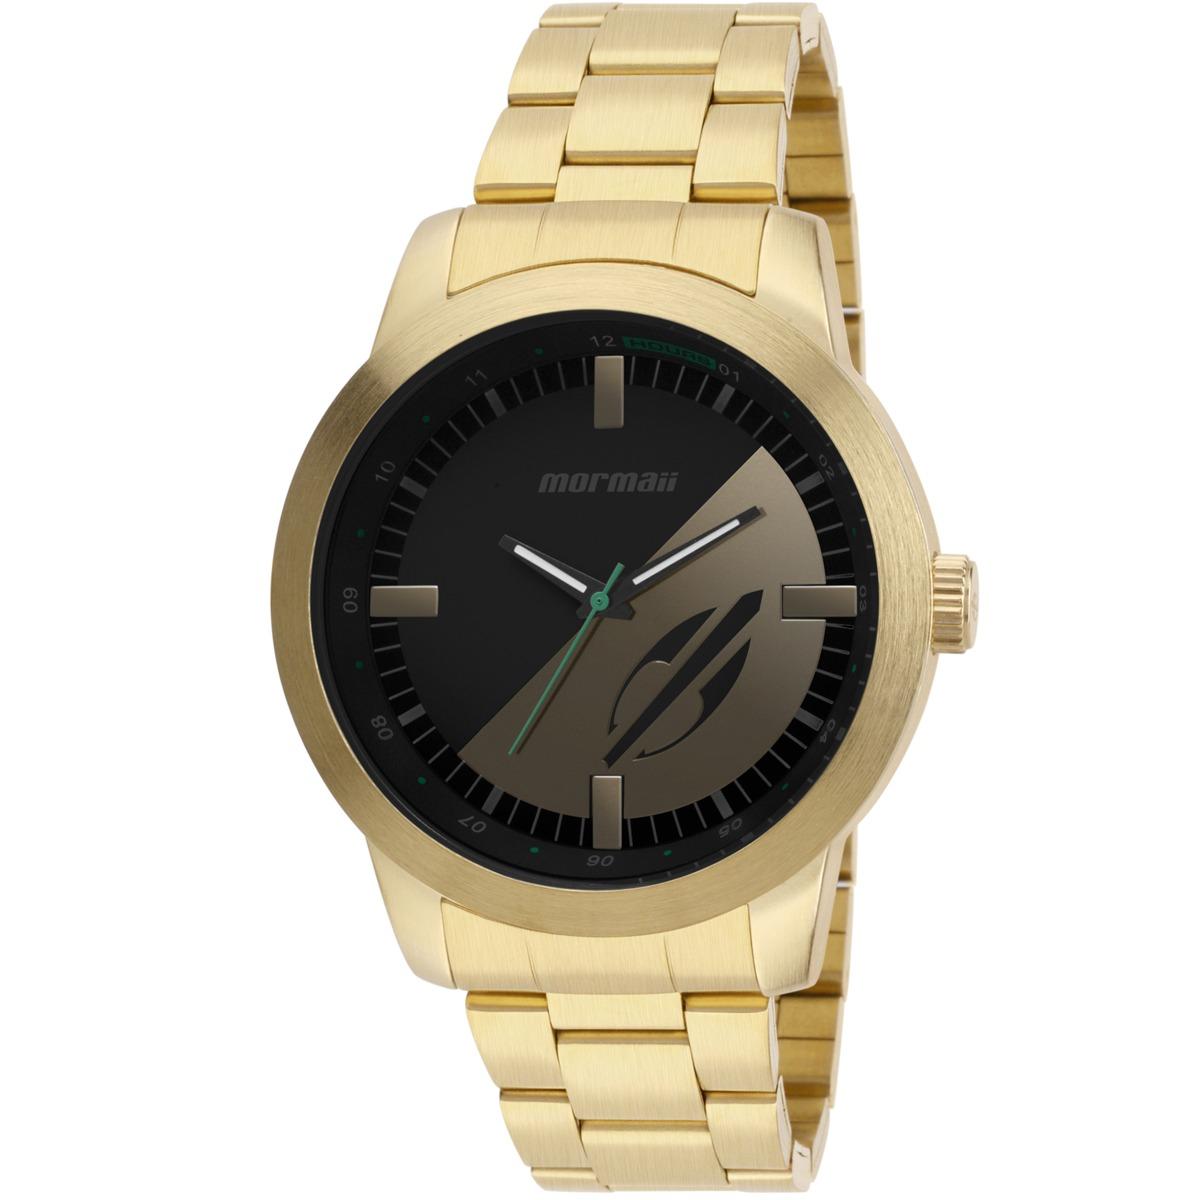 Relógio Mormaii On The Road Masculino Mo2035dt 4c - R  294,00 em ... 8536509e1d